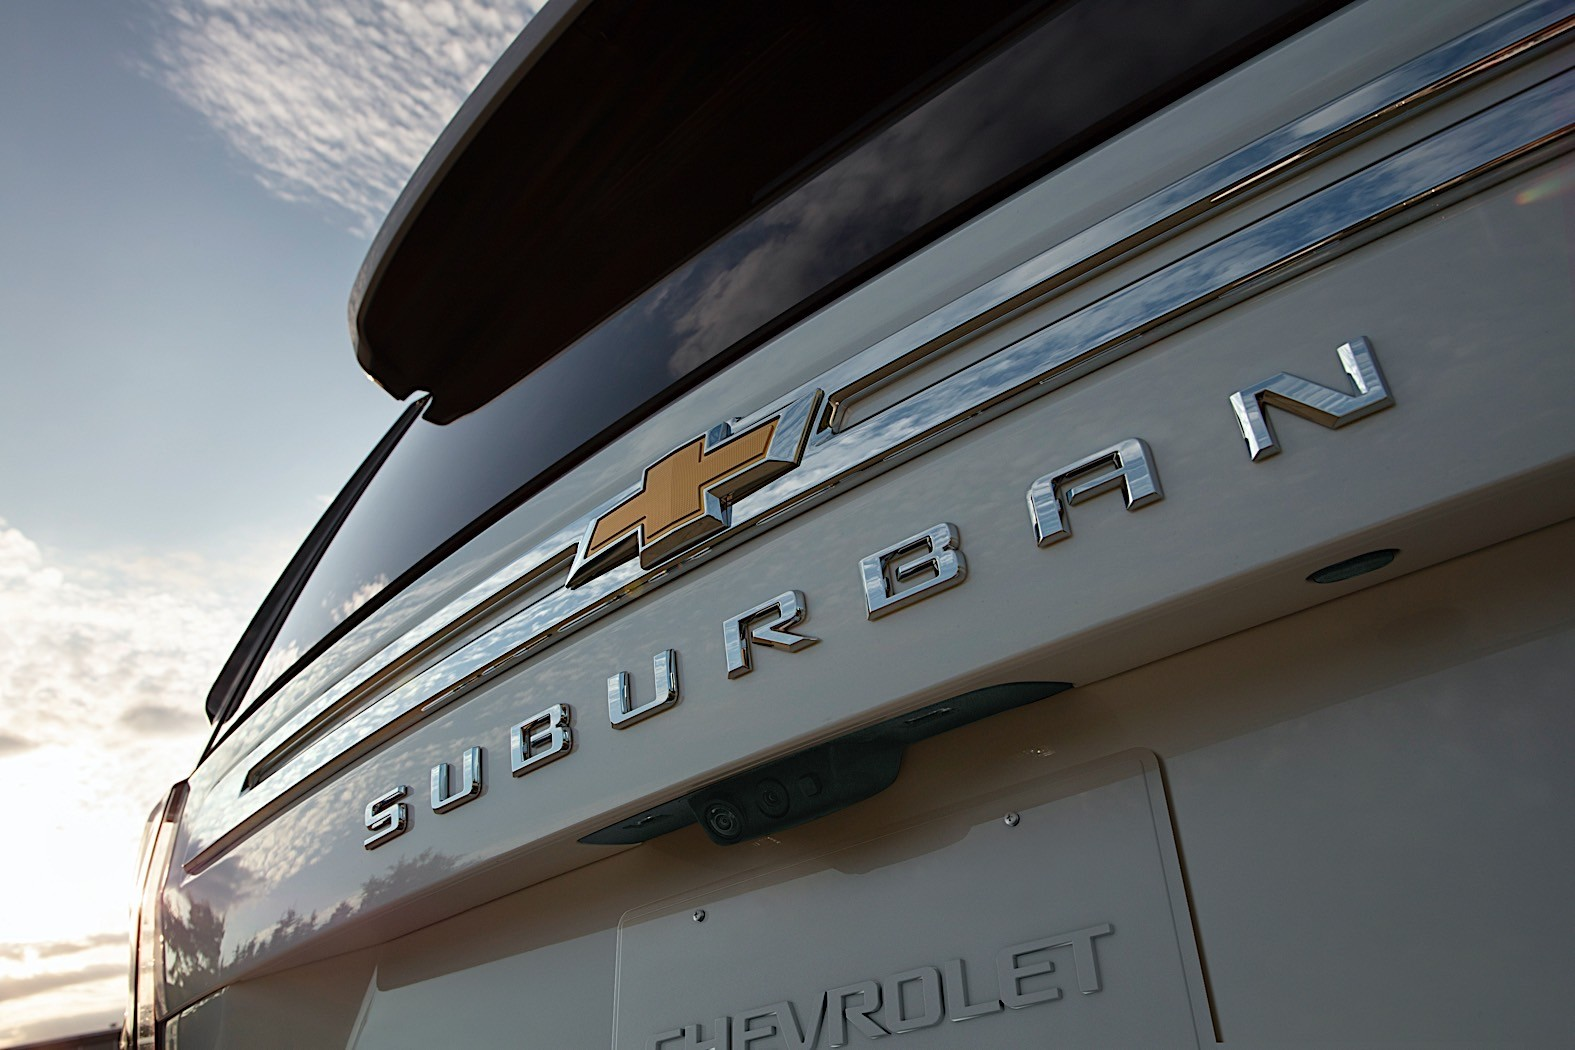 2021 Chevrolet Tahoe Pricing Announced, LS Trim Level ...